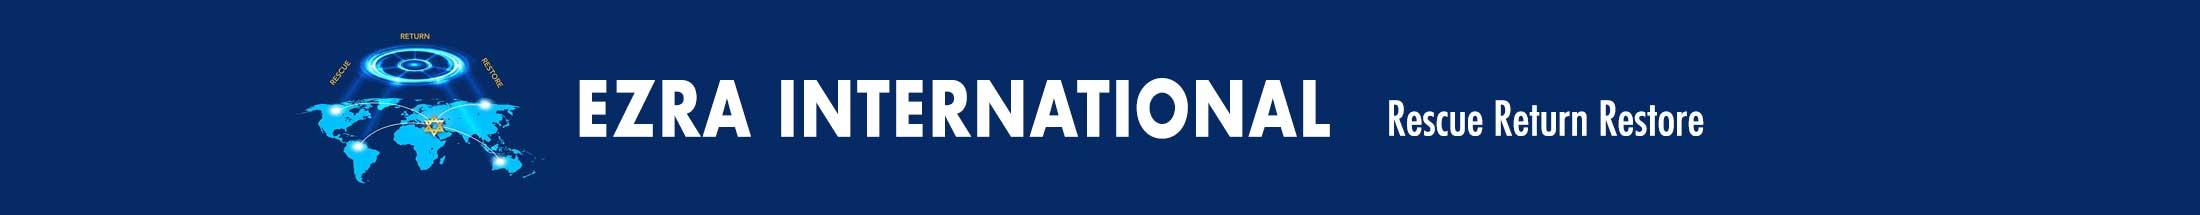 Ezra International Banner